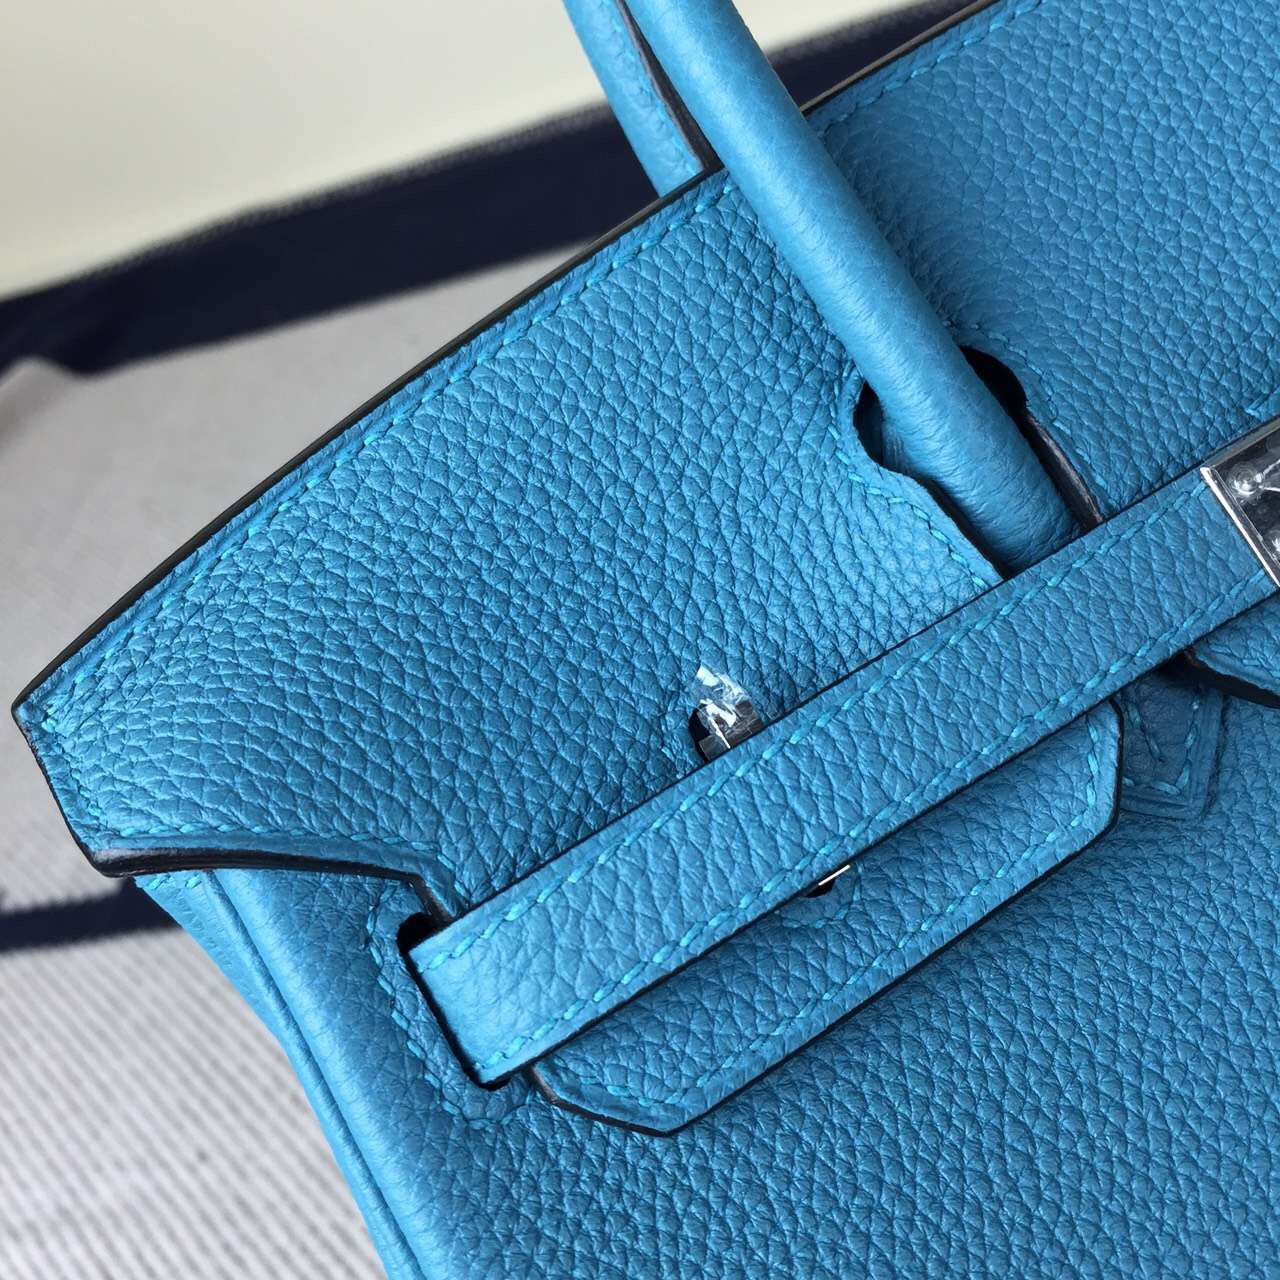 Discount Hermes 7B Turquoise Blue Togo Leather Birkin25cm Handbag